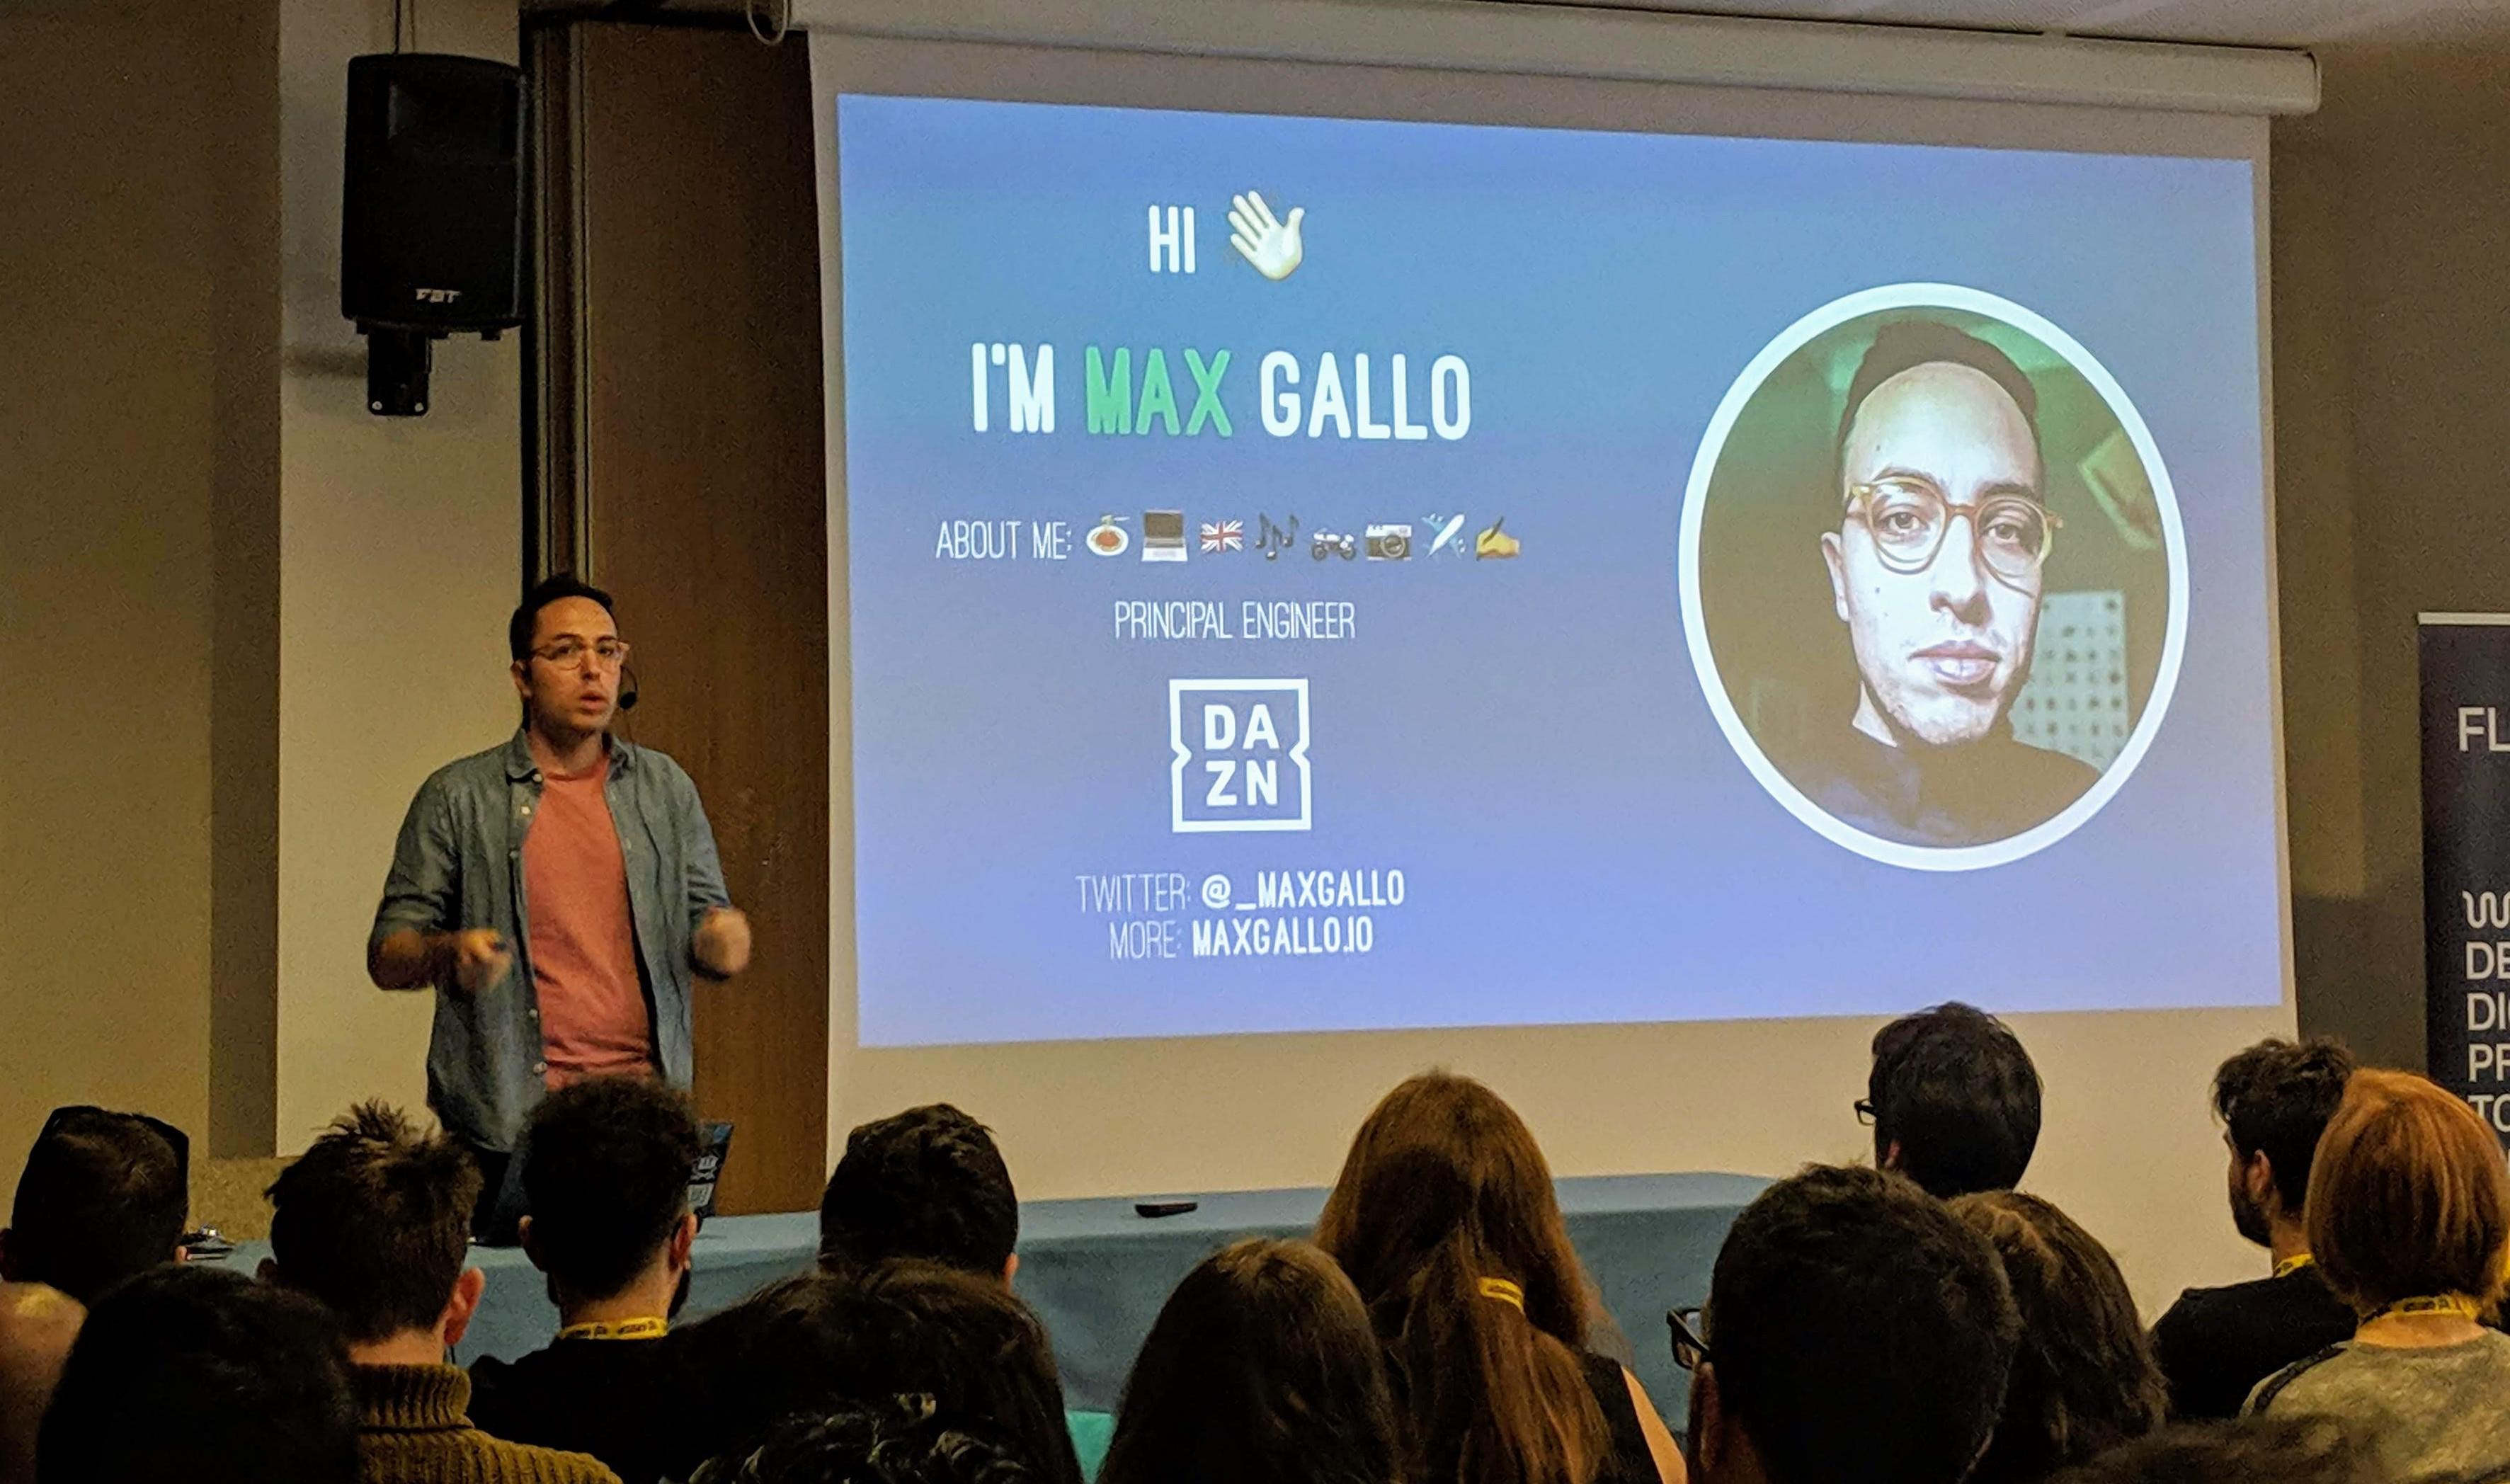 Max Gallo rewrites R X J S